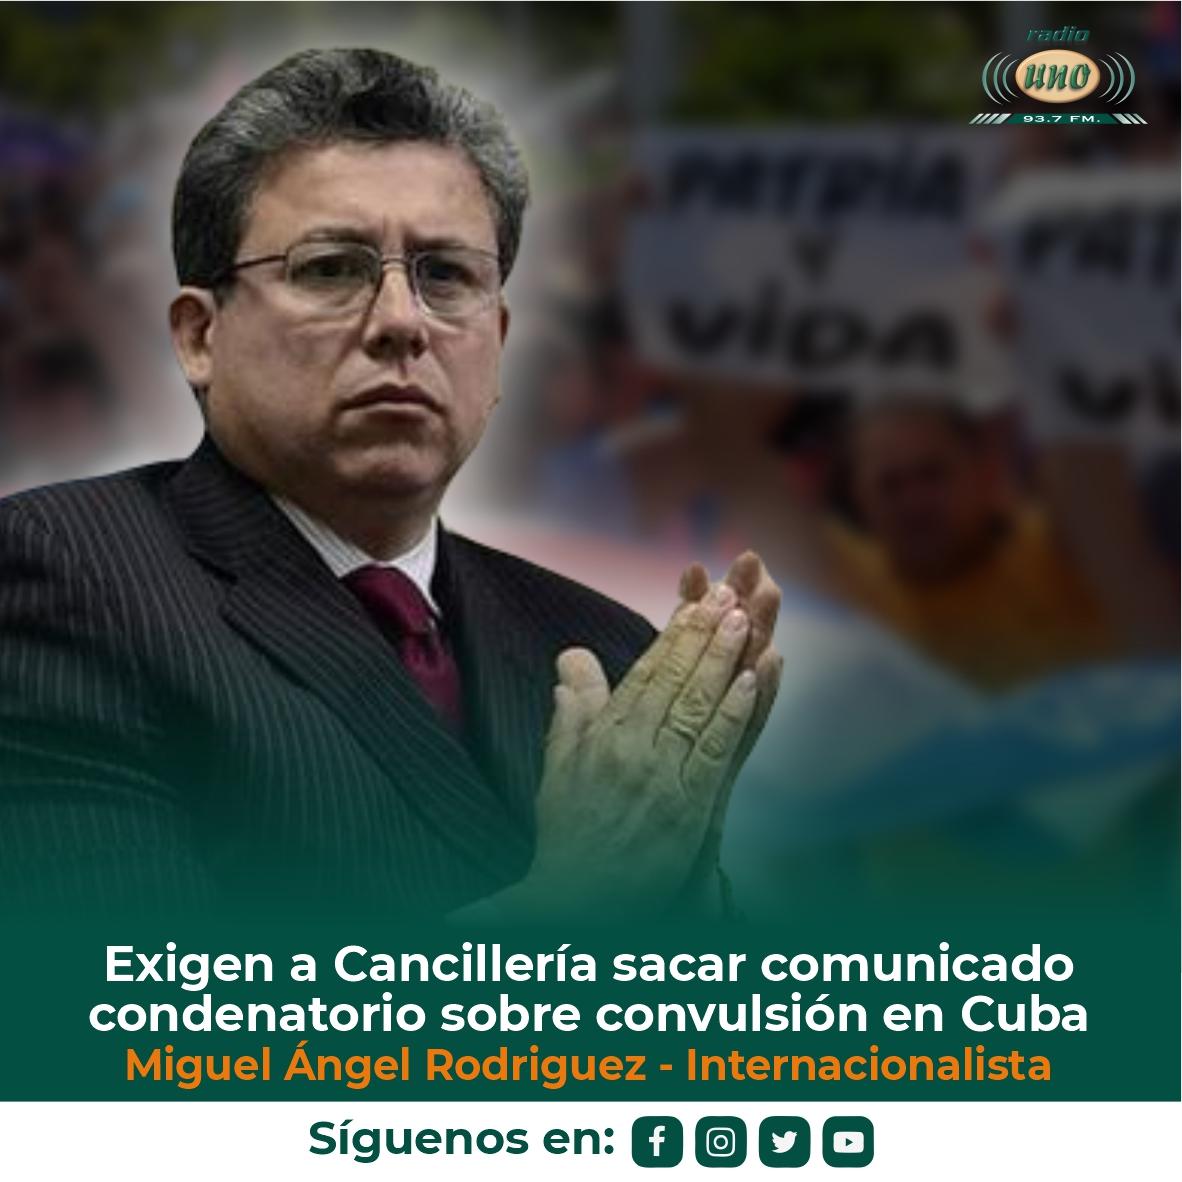 Exigen a Cancillería sacar comunicado condenatorio sobre convulsión en Cuba